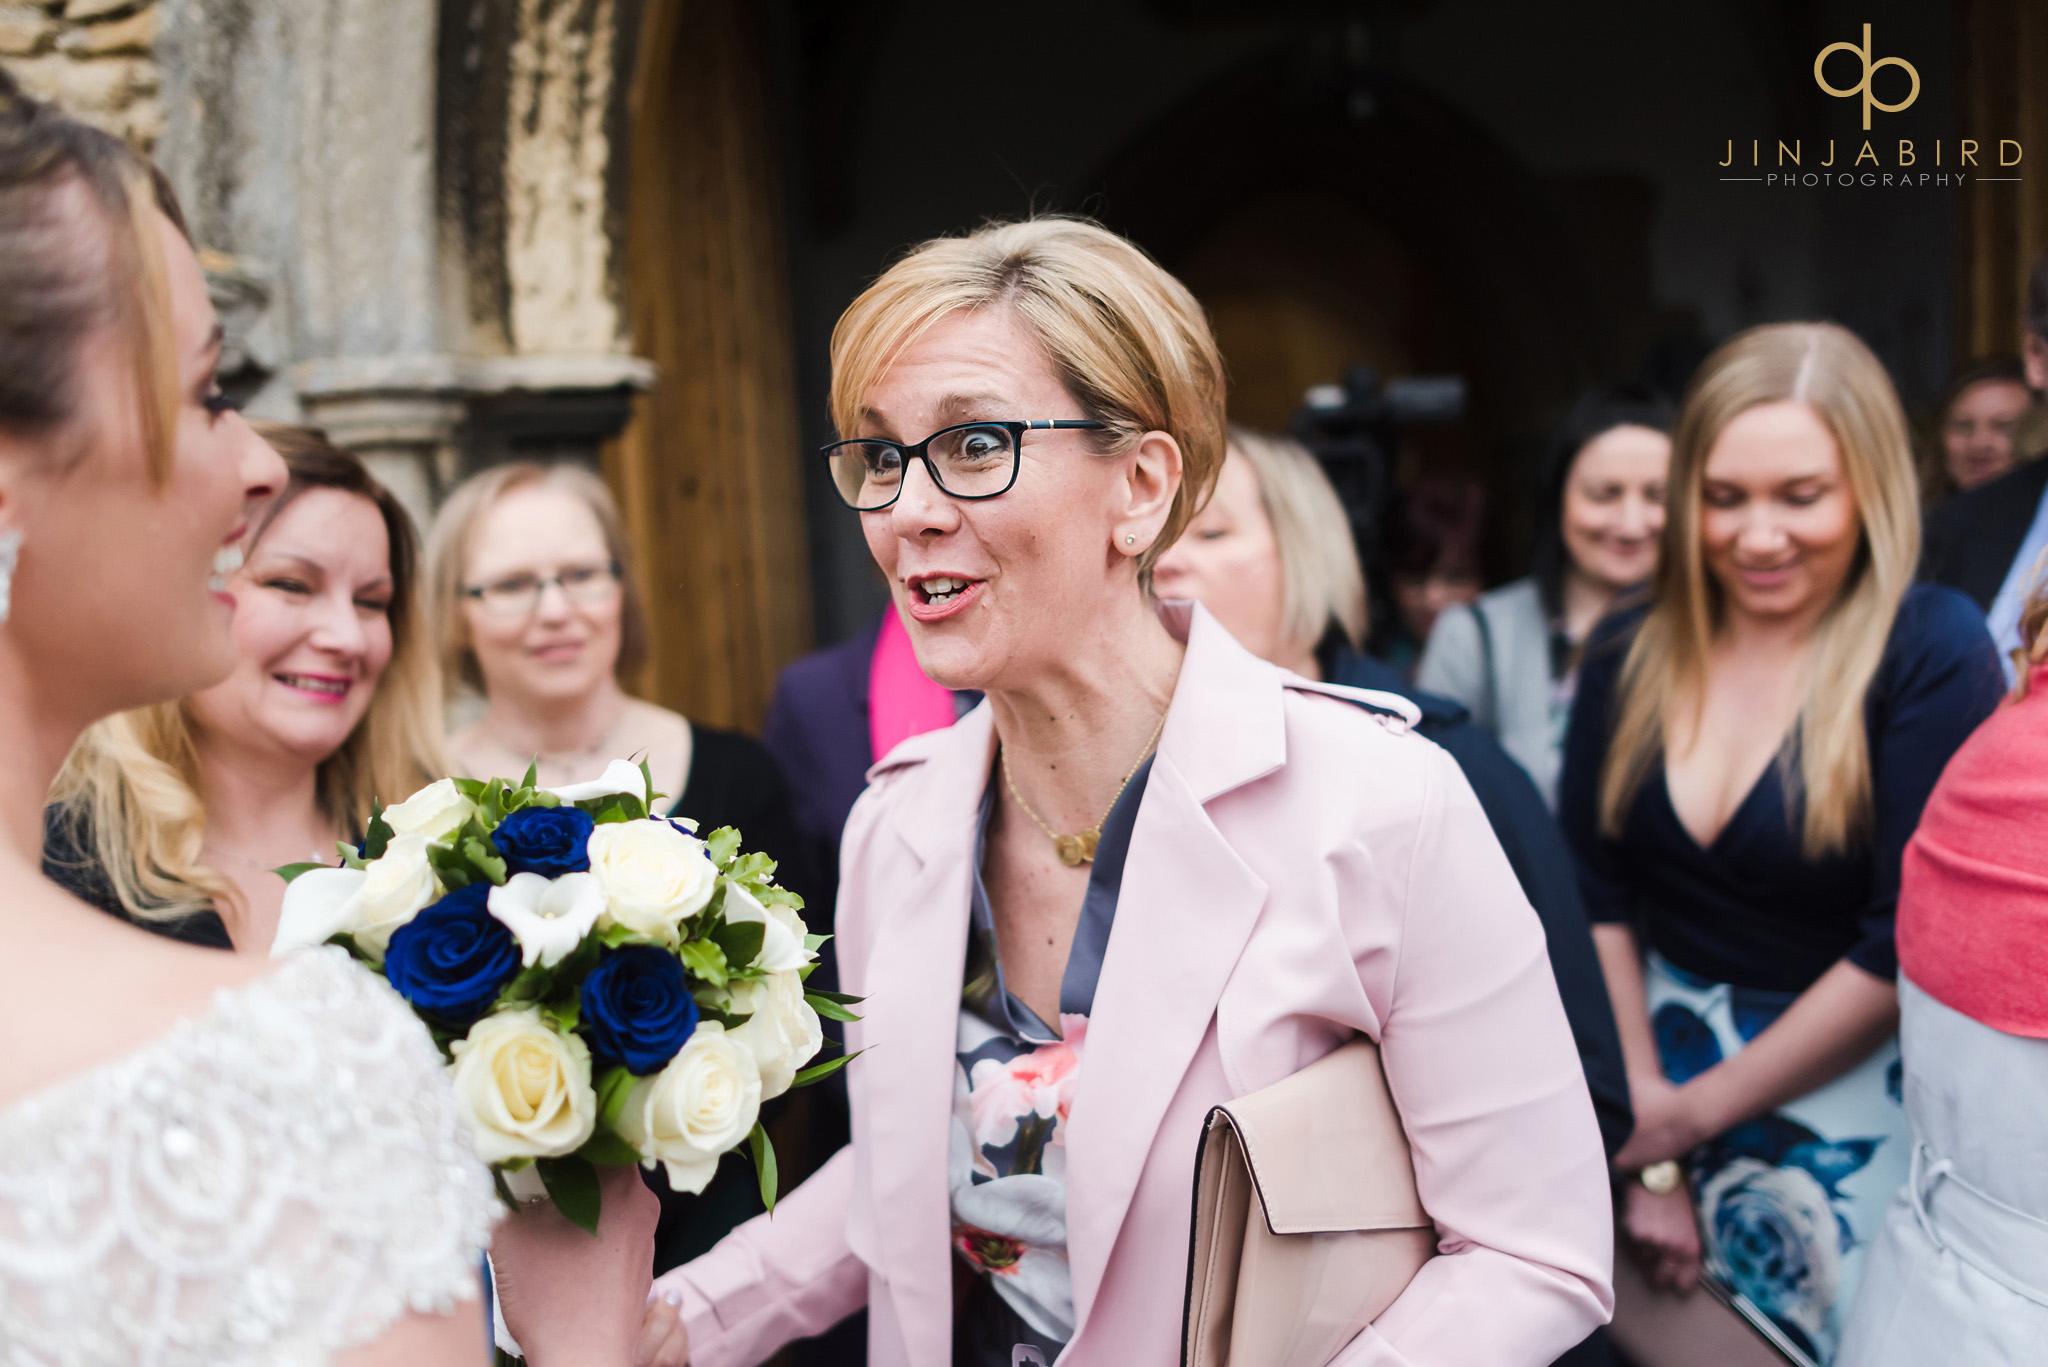 wedding guest with bride